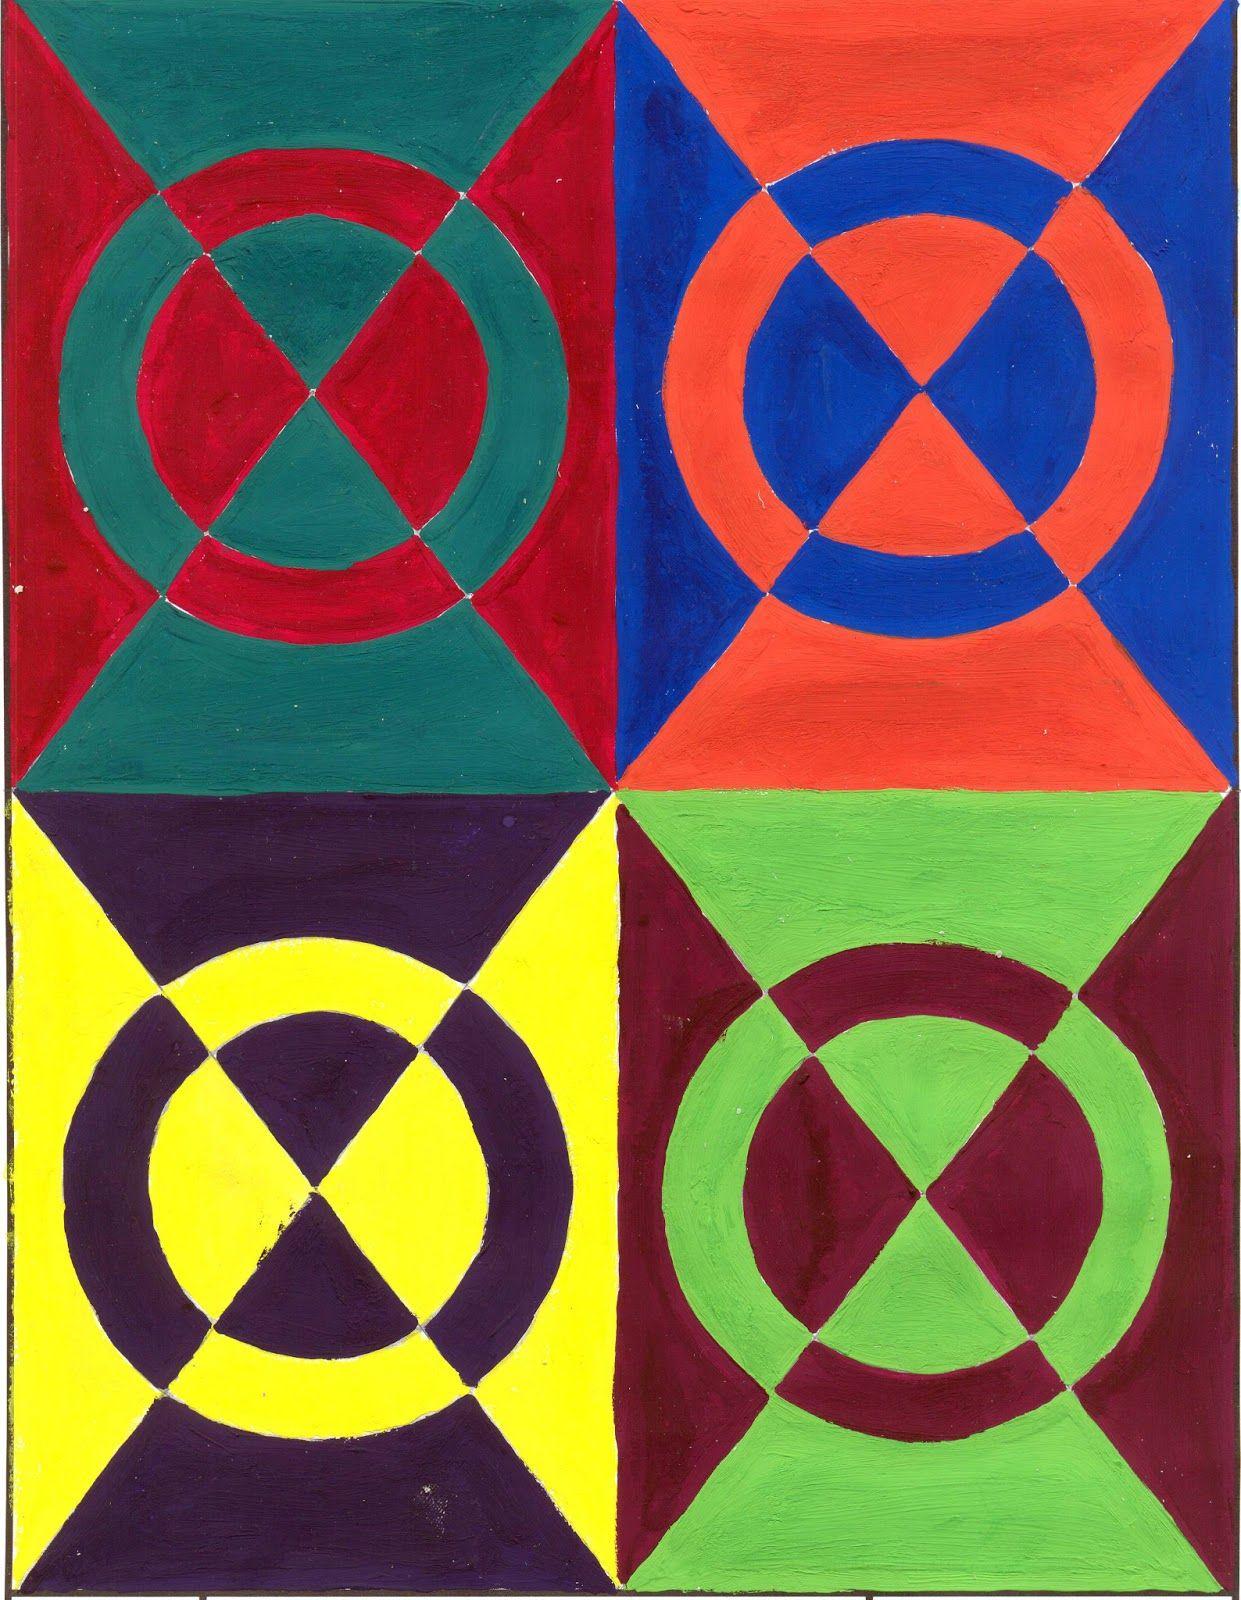 Colores Complementarios Actividades Buscar Con Google Dibujos De Colores Colores Complementarios Dibujos